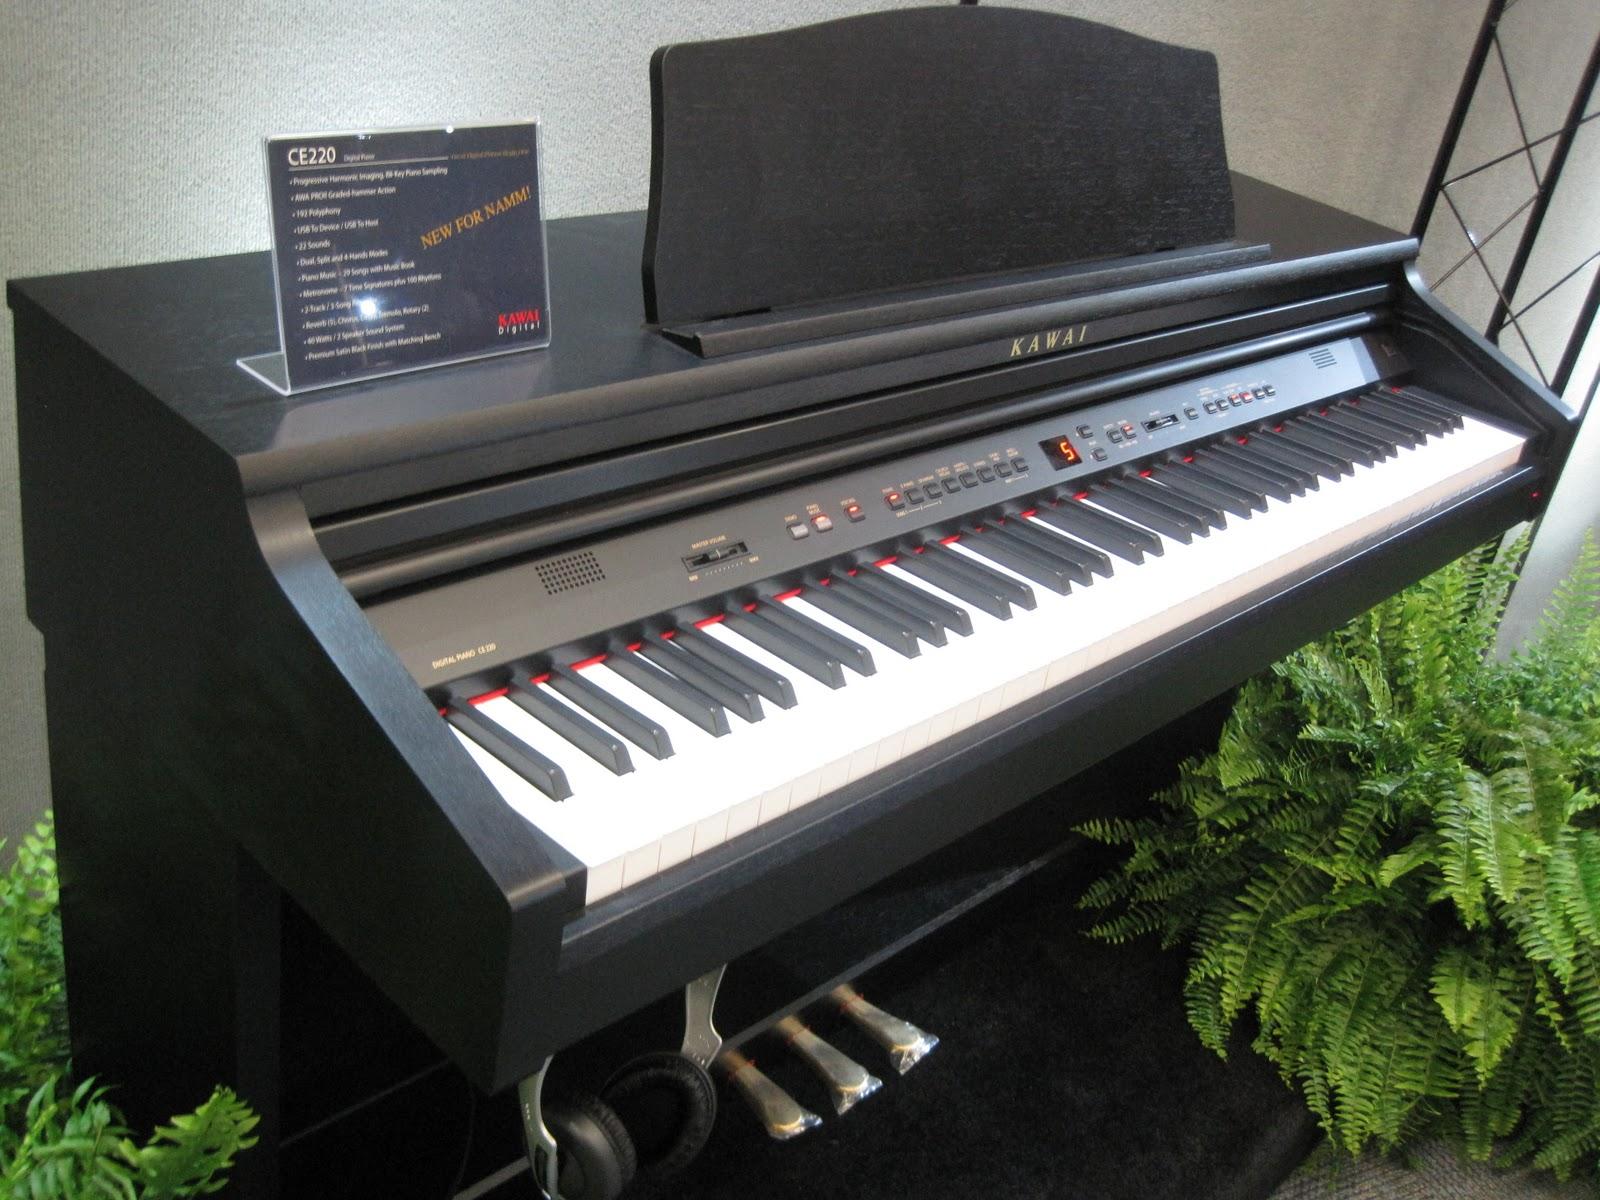 az piano reviews review yamaha ydp c71 digital piano. Black Bedroom Furniture Sets. Home Design Ideas